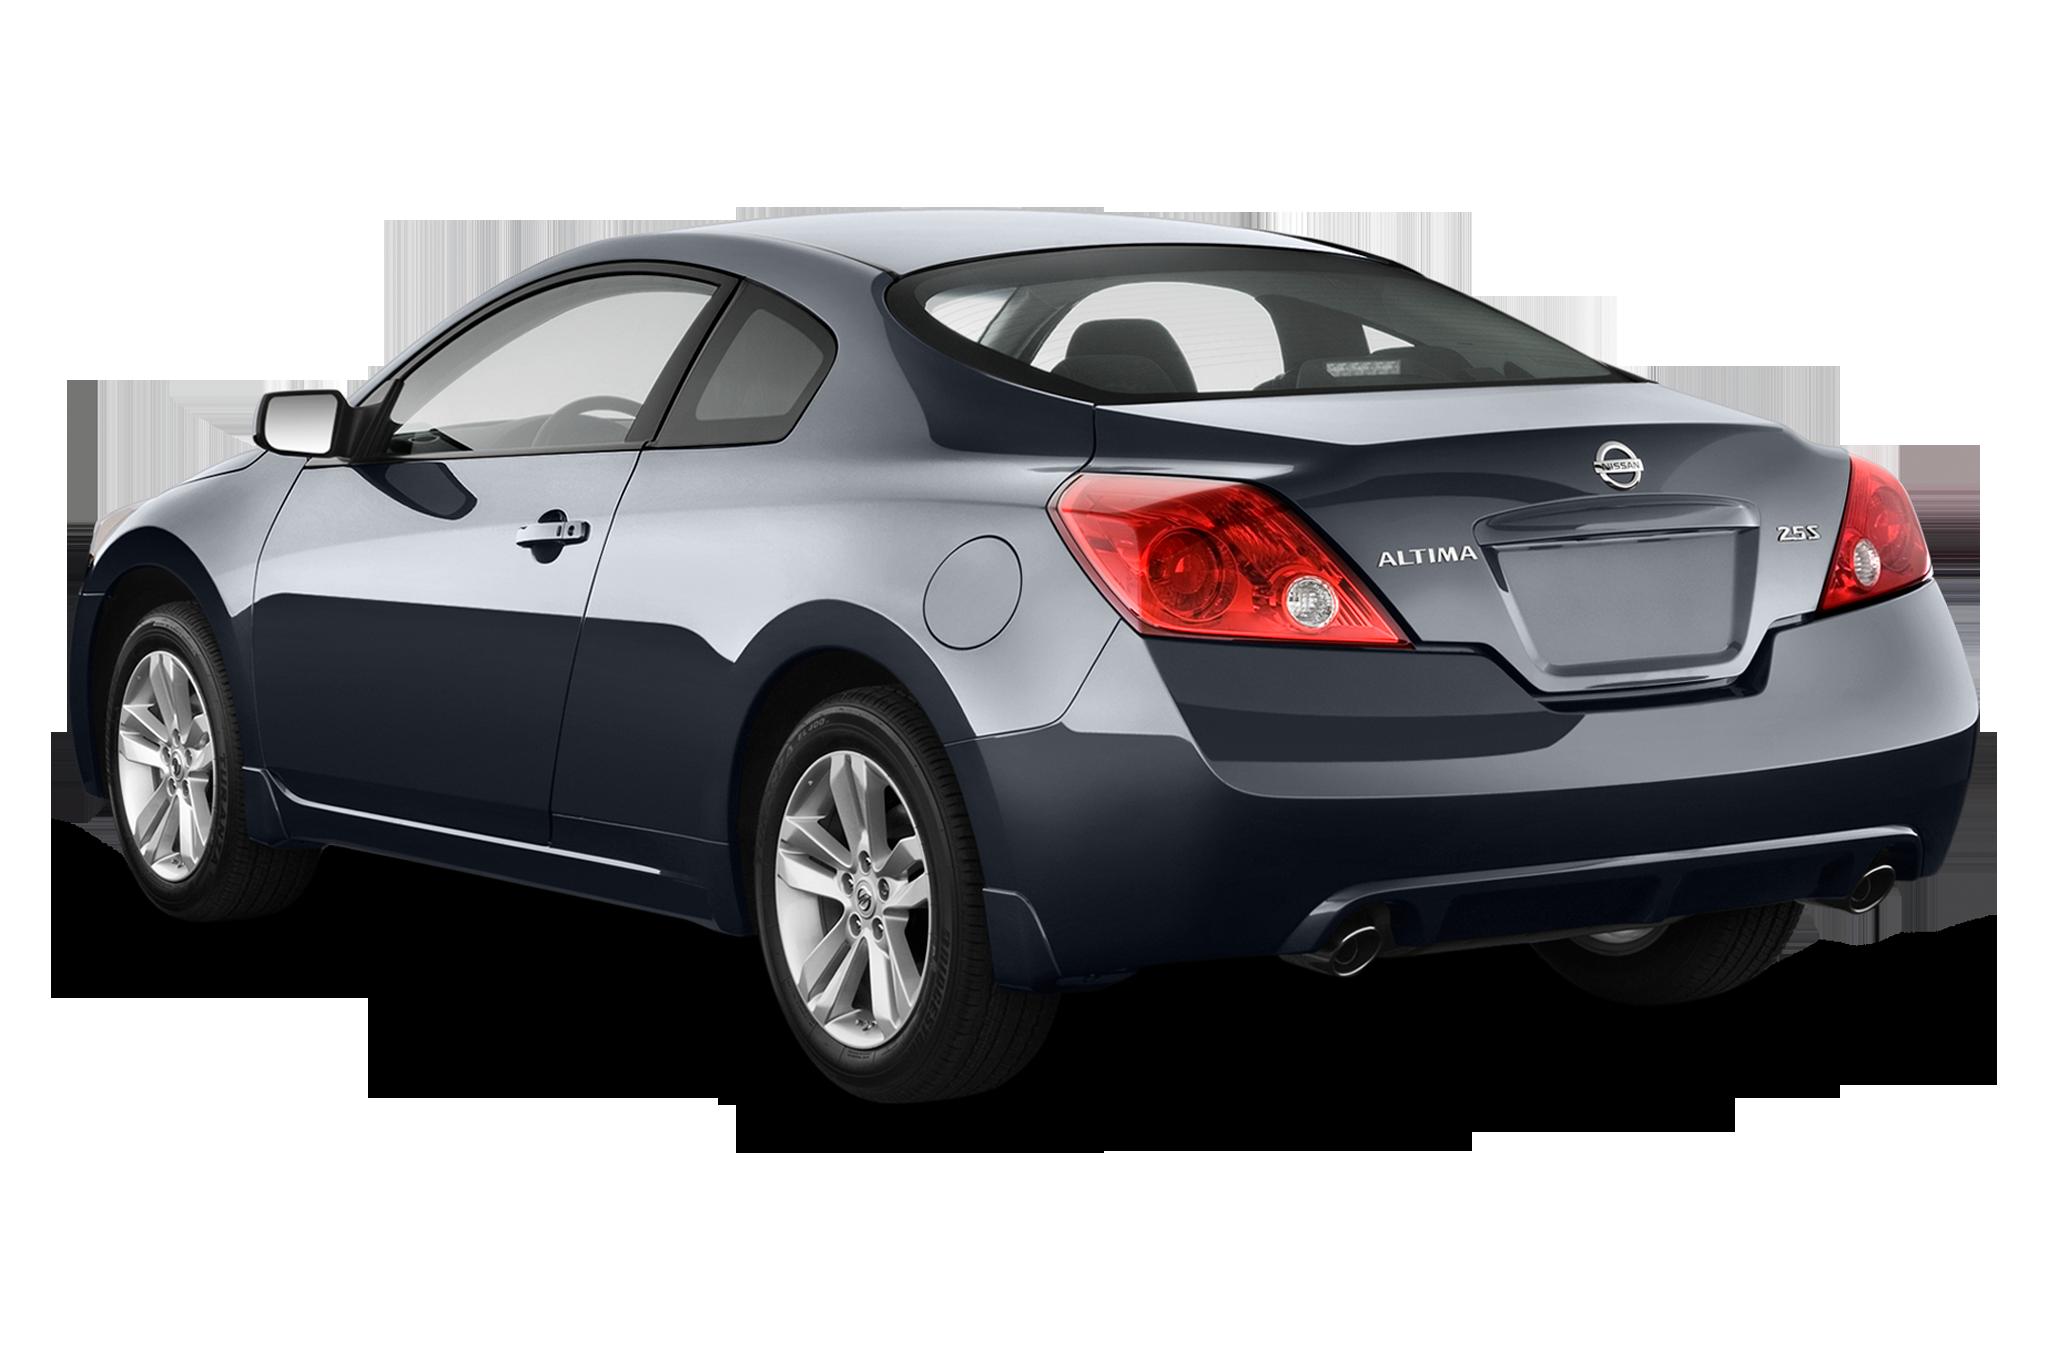 Nissan Altima 2 5s >> 2012 Nissan Altima 2.5S - Editors' Notebook - Automobile Magazine